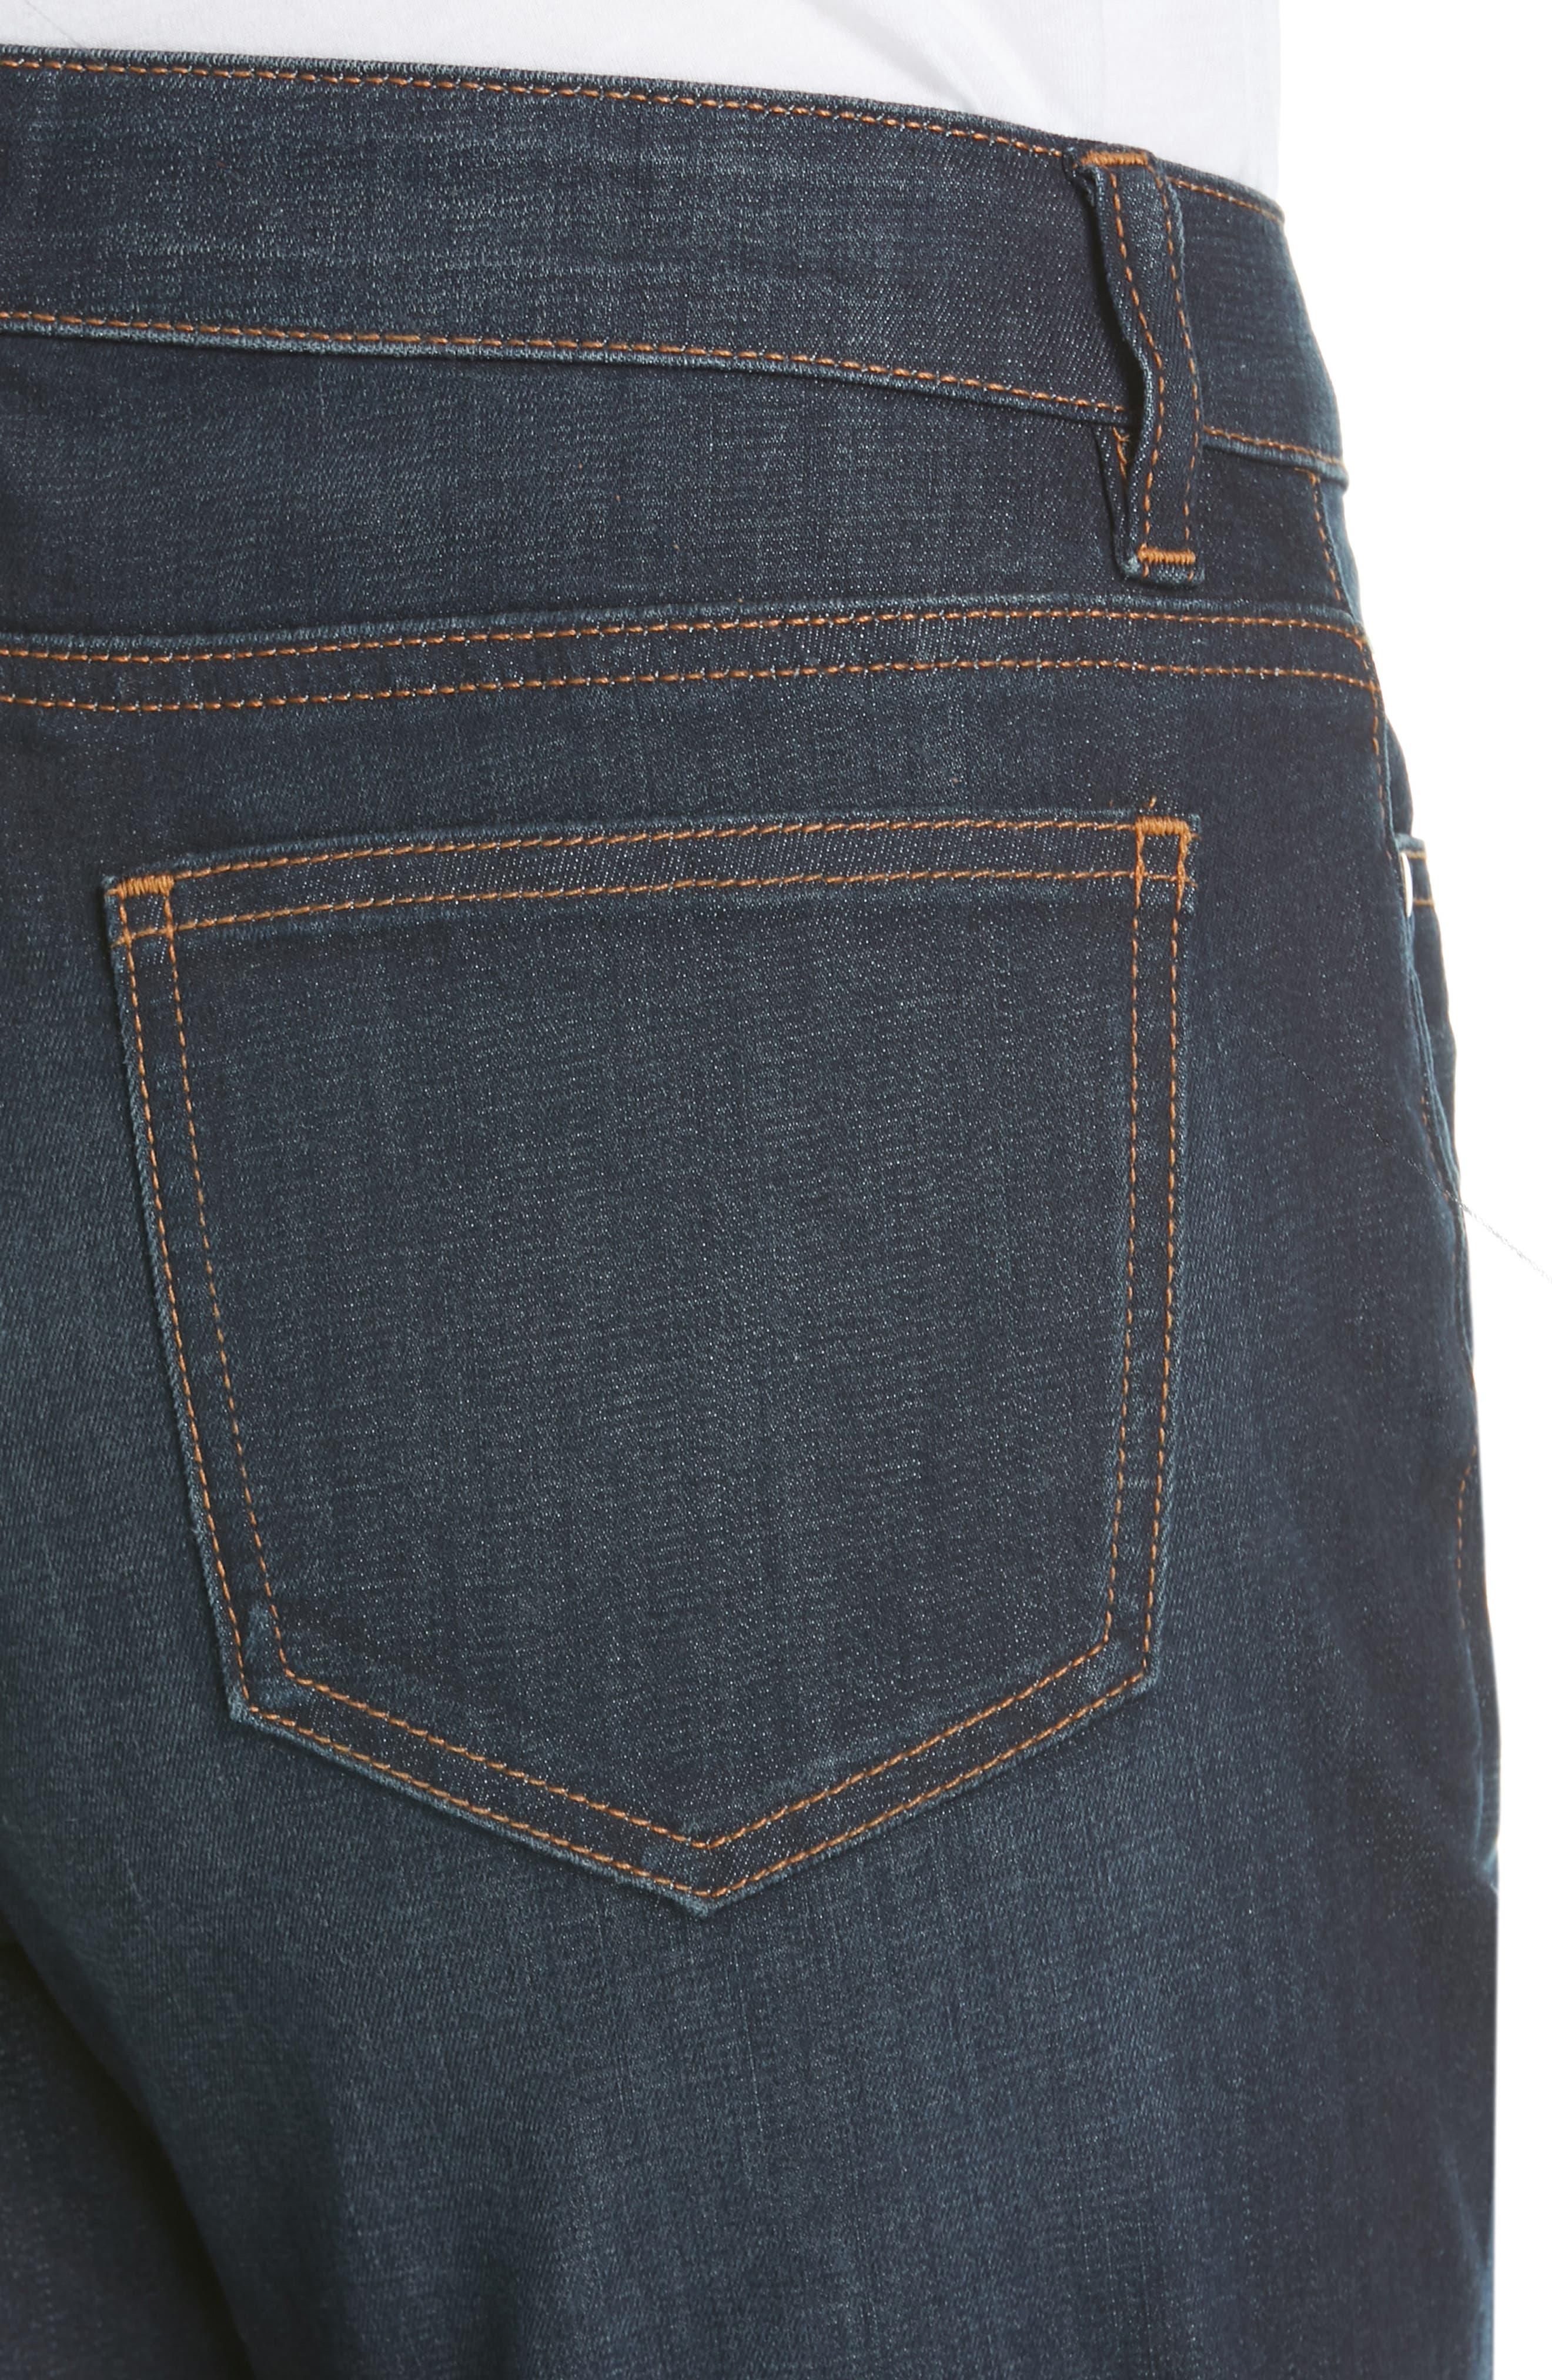 EILEEN FISHER, Raw Step Hem Slim Ankle Jeans, Alternate thumbnail 5, color, UTILITY BLUE